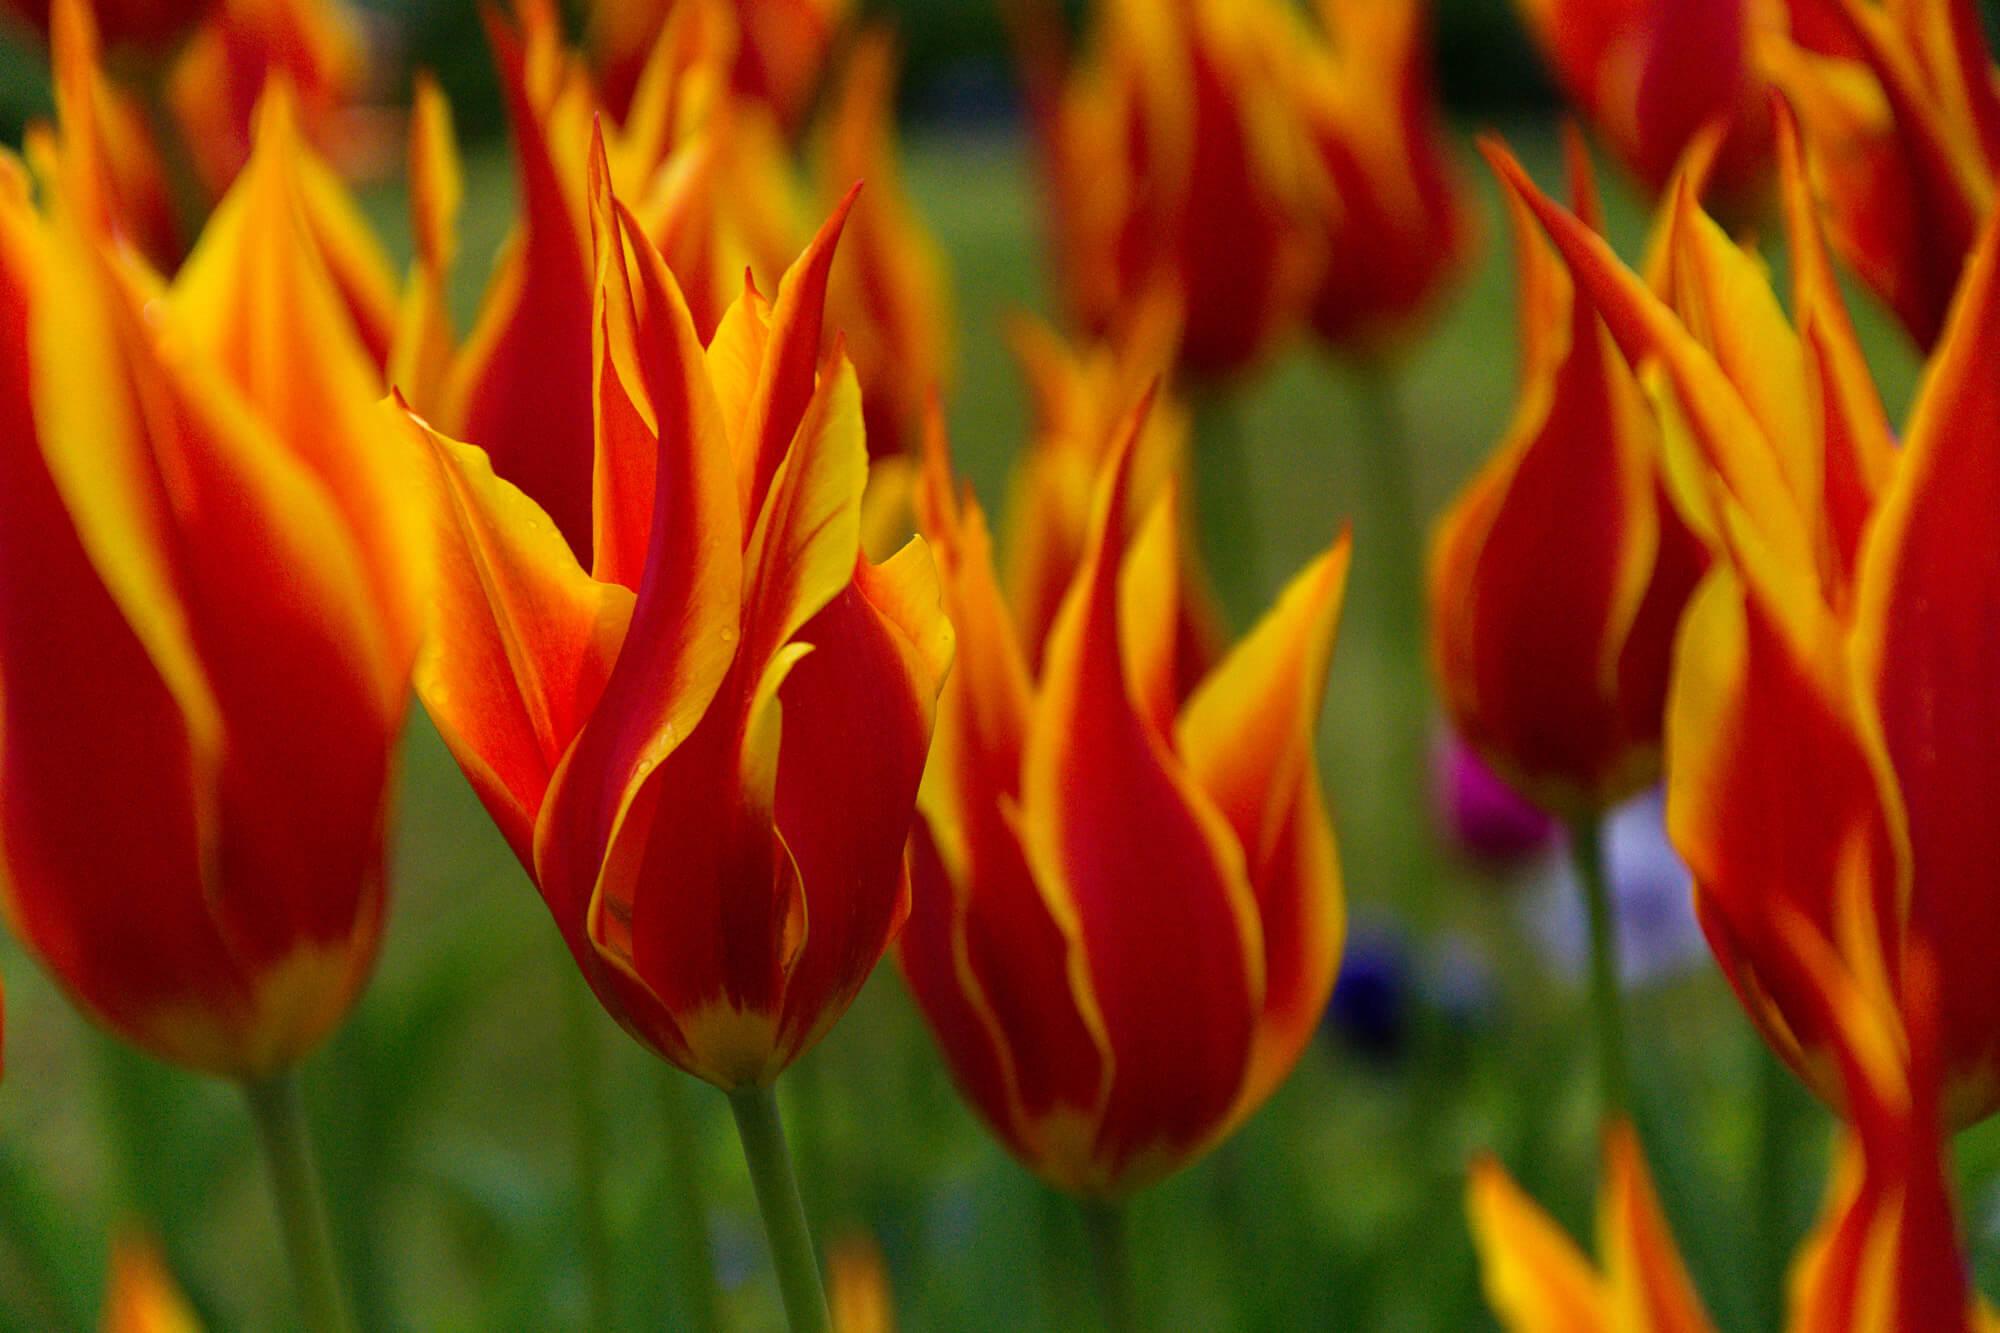 tulipe keukenhof parc floral lisse hollande visite